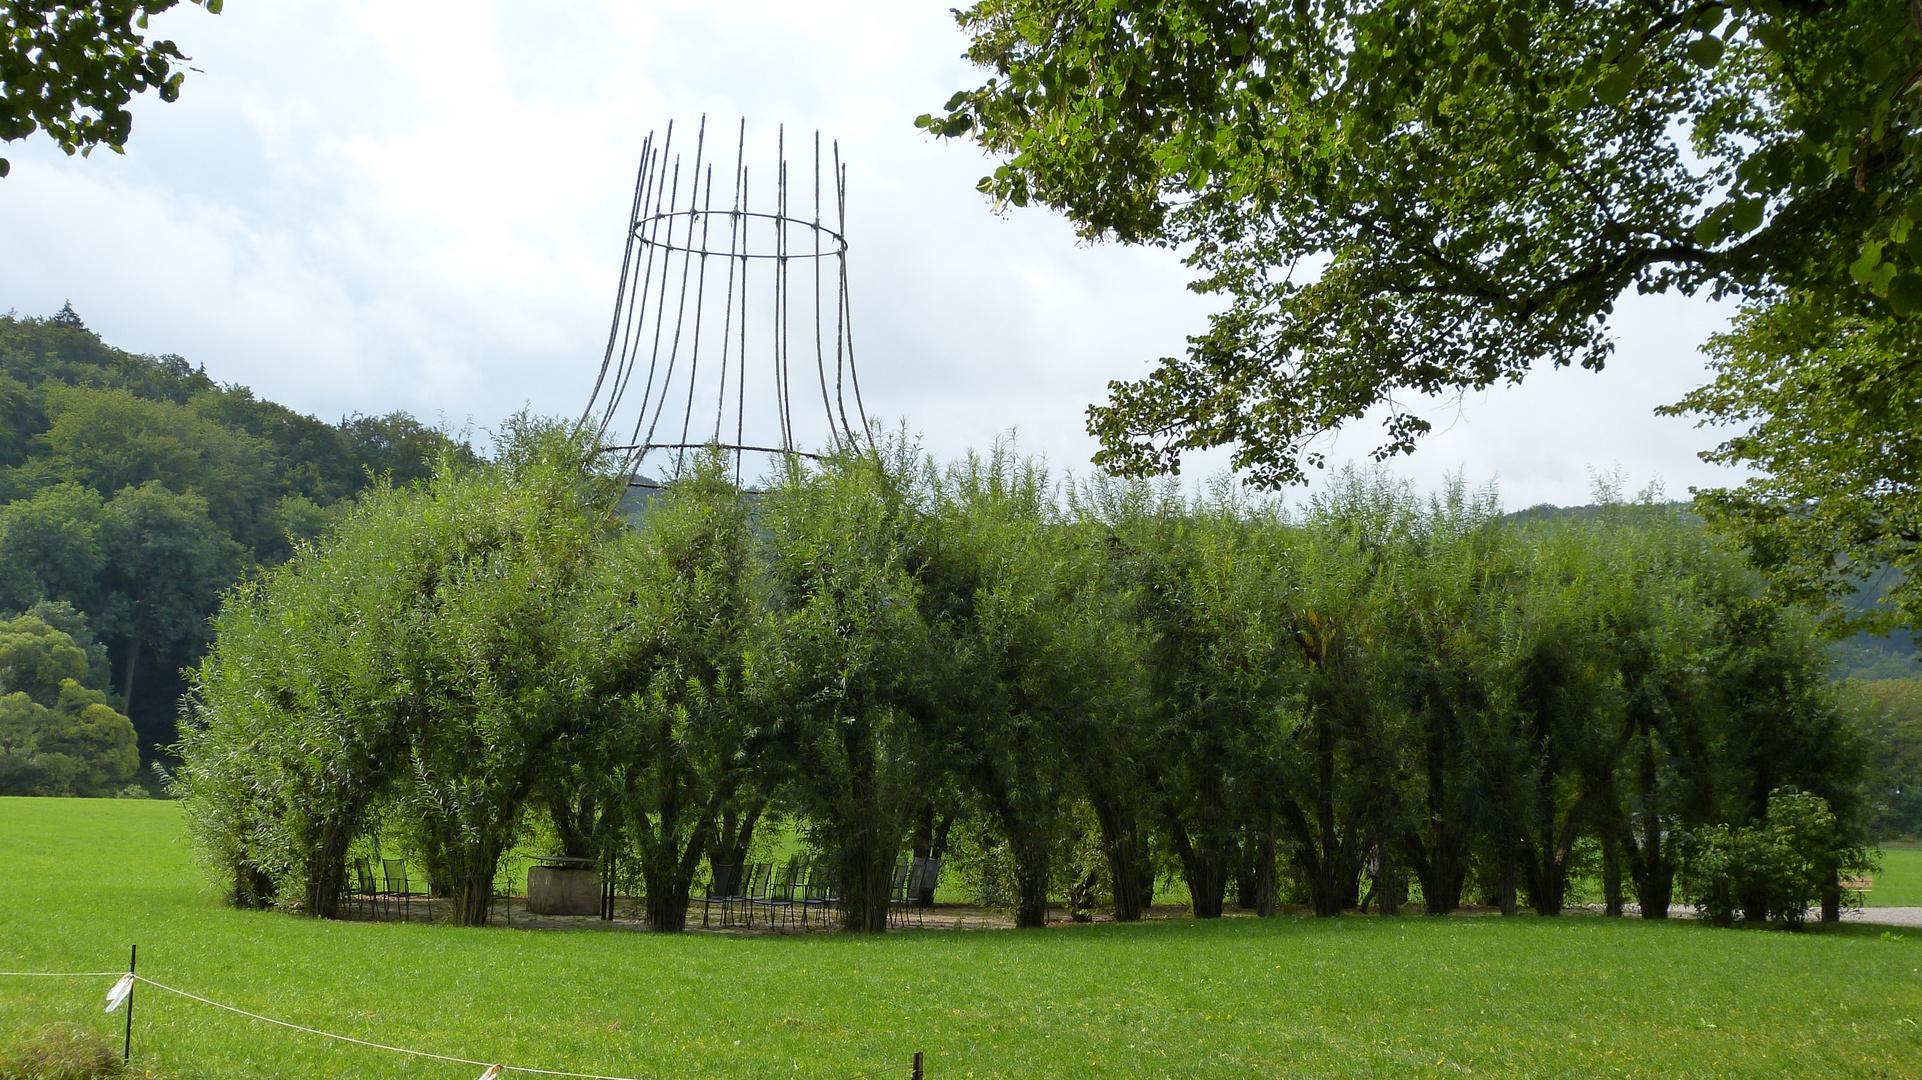 1. Weidenkirche Bayerns 1